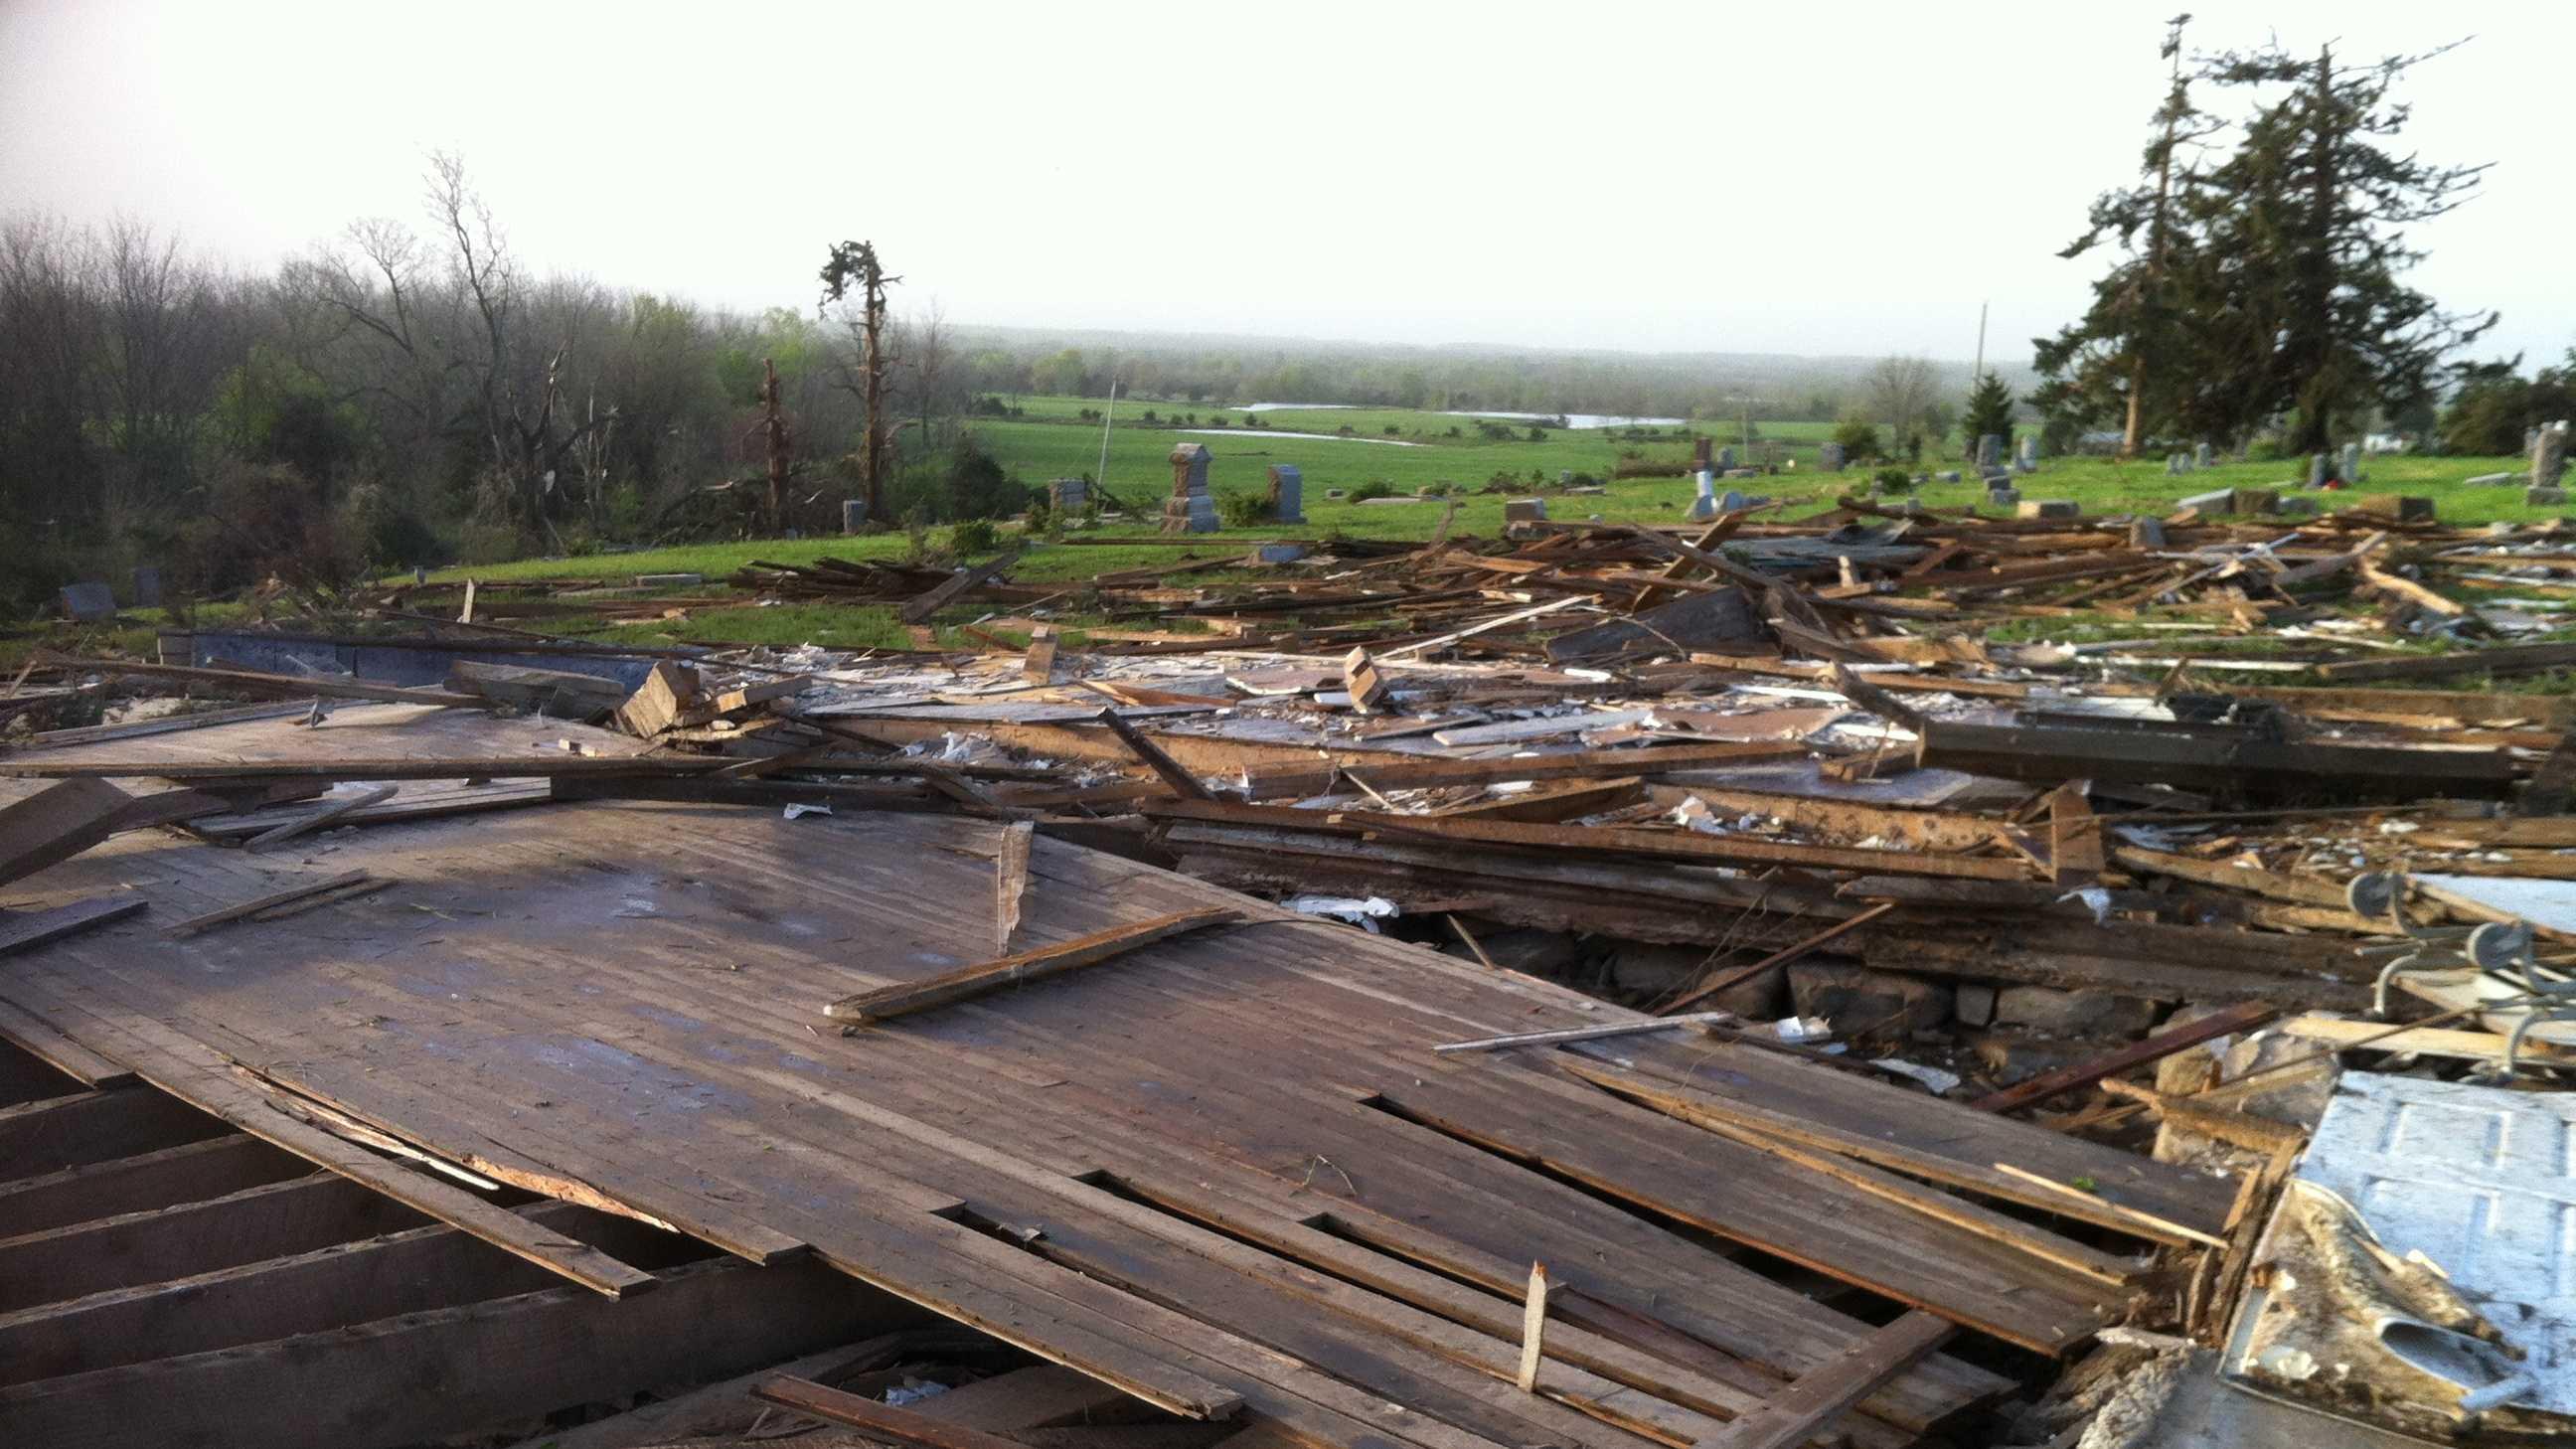 Tornado flattens old church in Linn County, Kansas